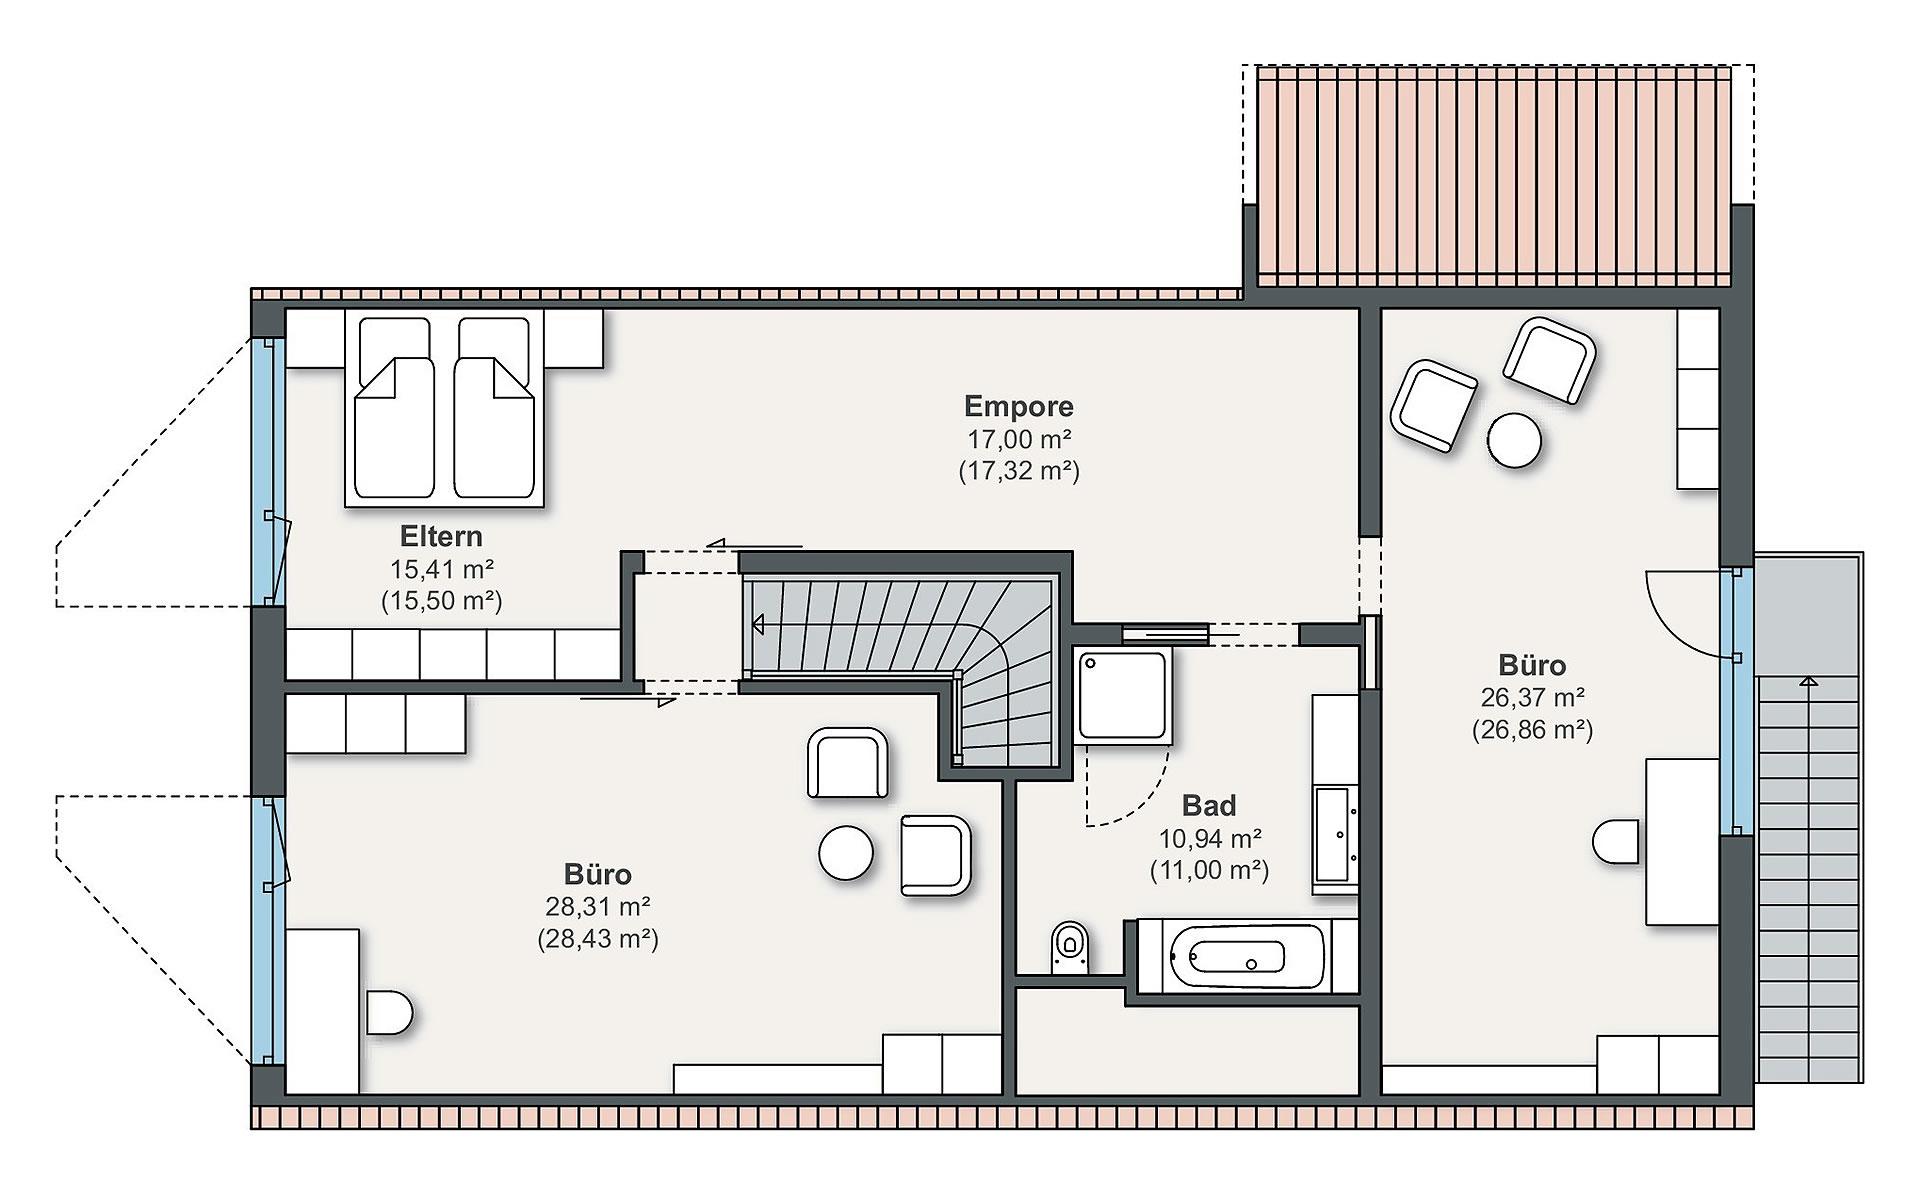 Dachgeschoss Individual (Gazda) von WeberHaus GmbH & Co. KG